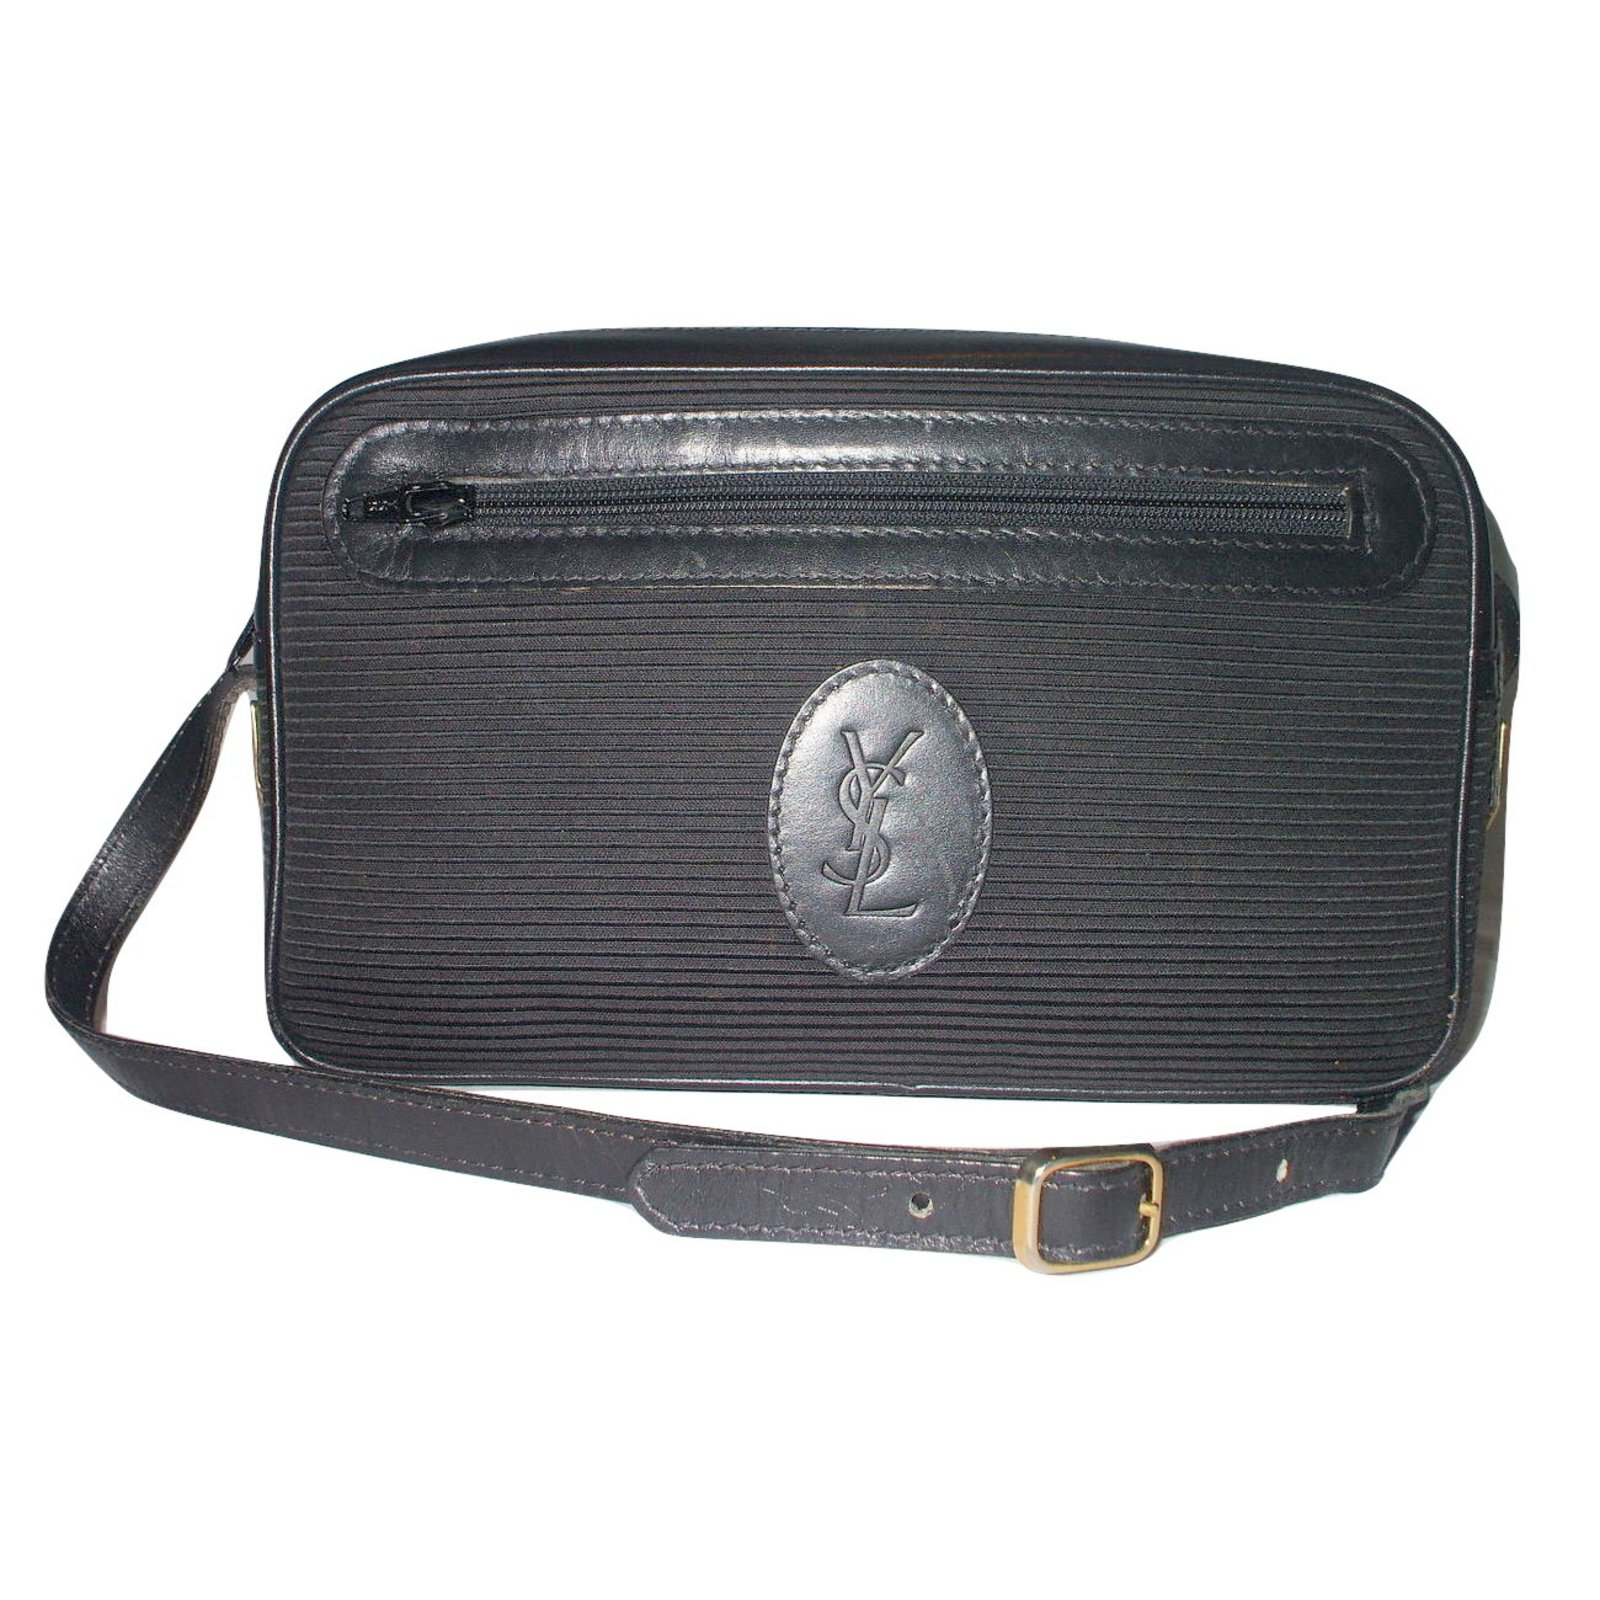 58c7457a869 Yves Saint Laurent Handbags Handbags Cloth Black ref.15413 - Joli Closet